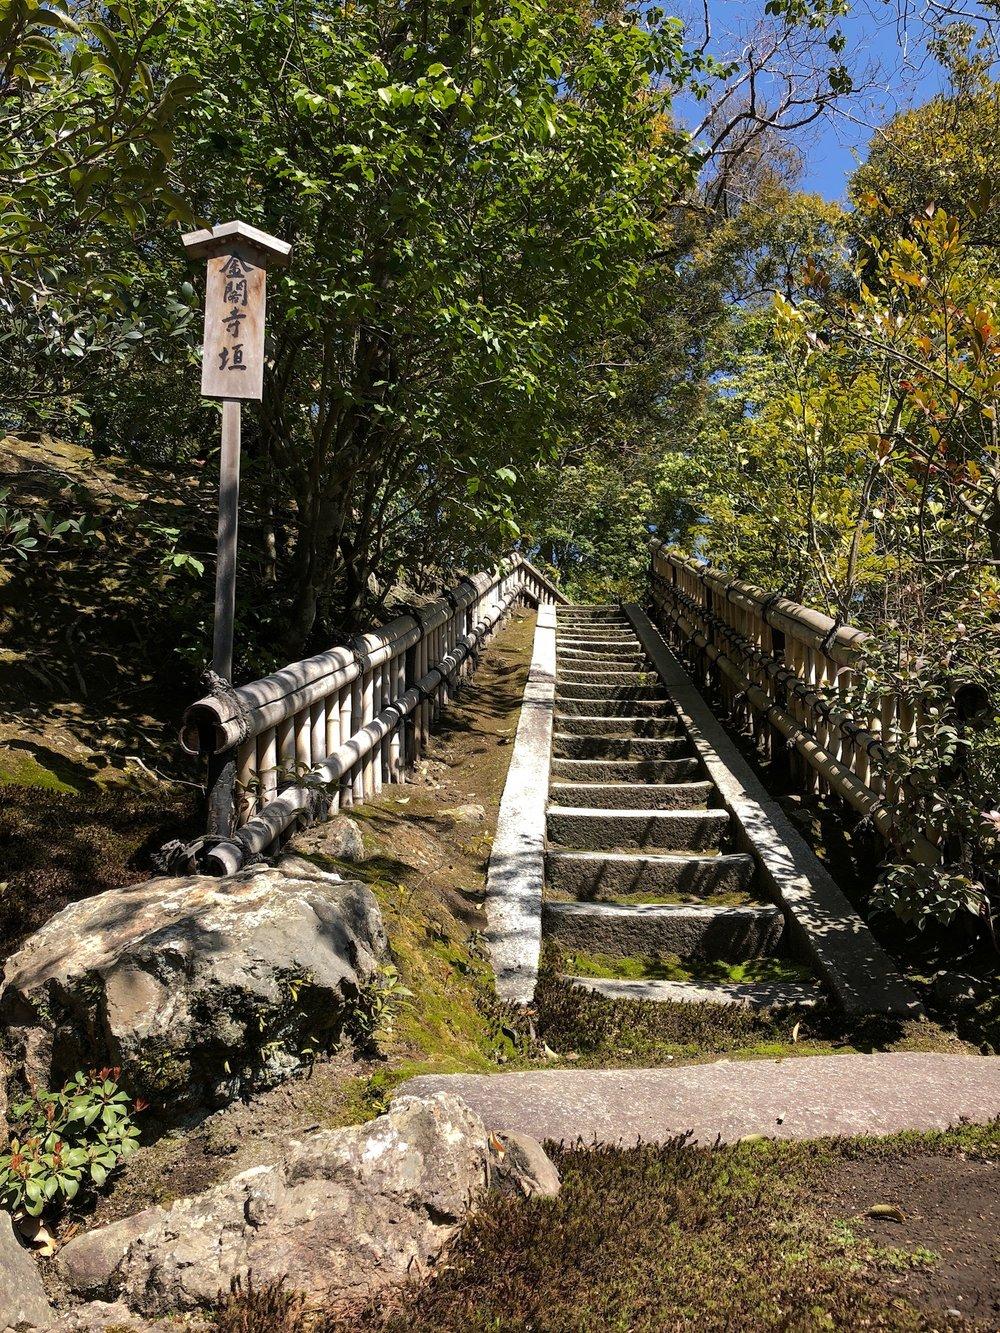 Very old steps into nature on the grounds of Kinkaku-ji.